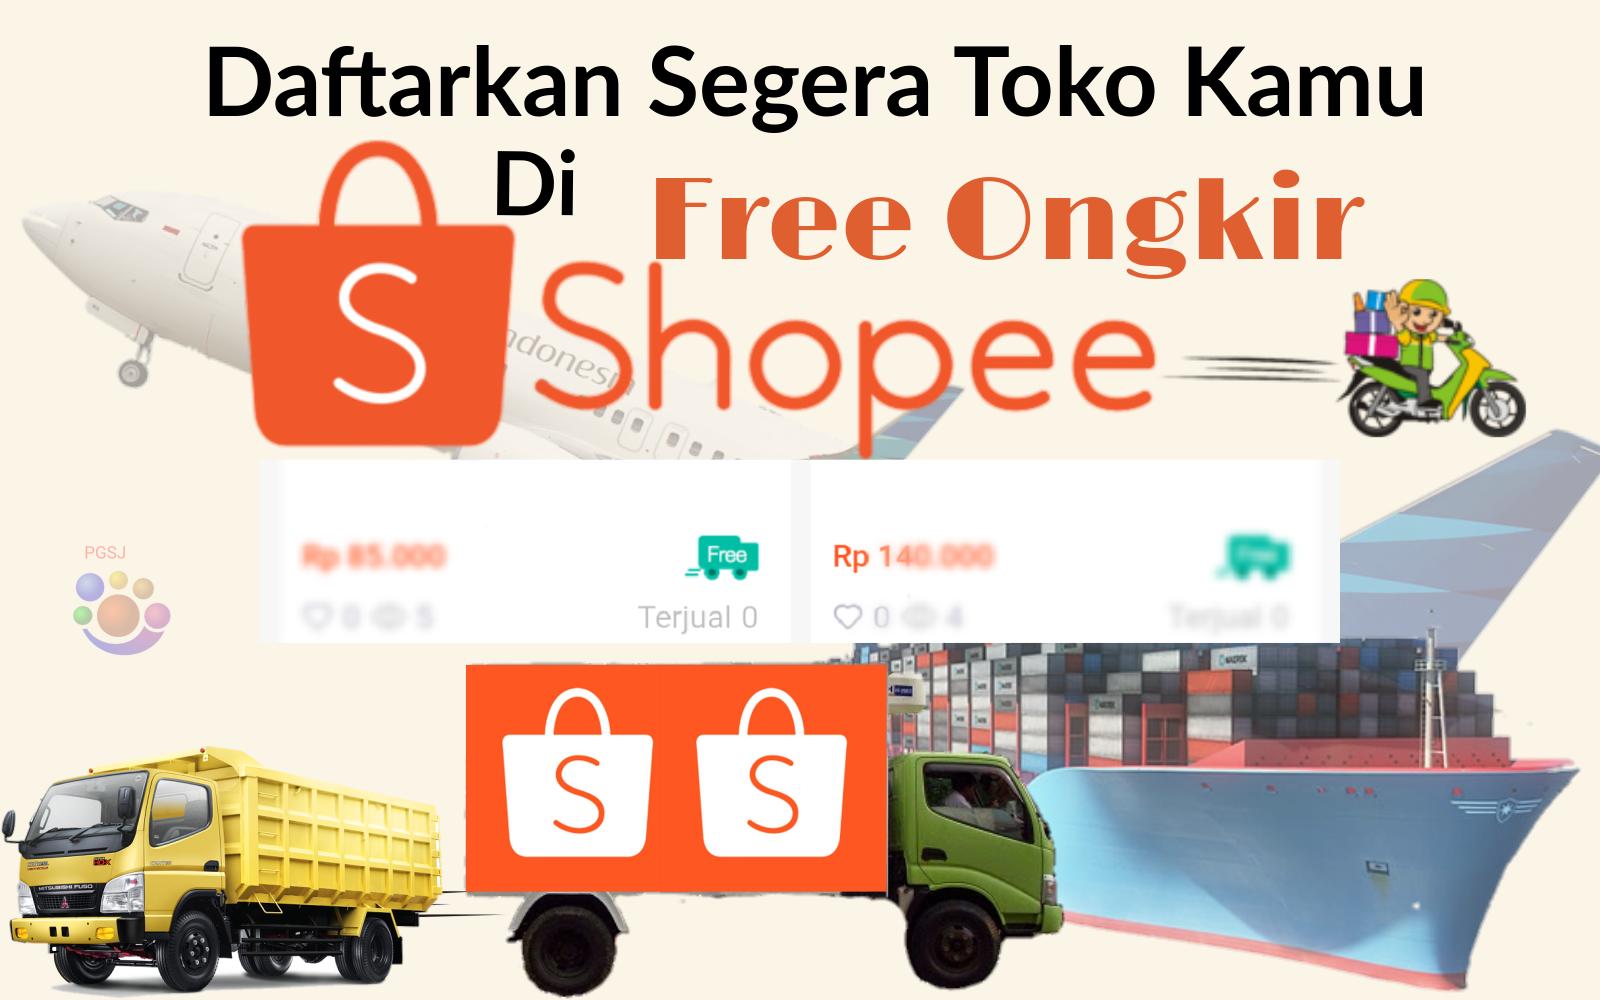 Cara Mengikuti Program Ongkir Grais Shopee Pgsj Online